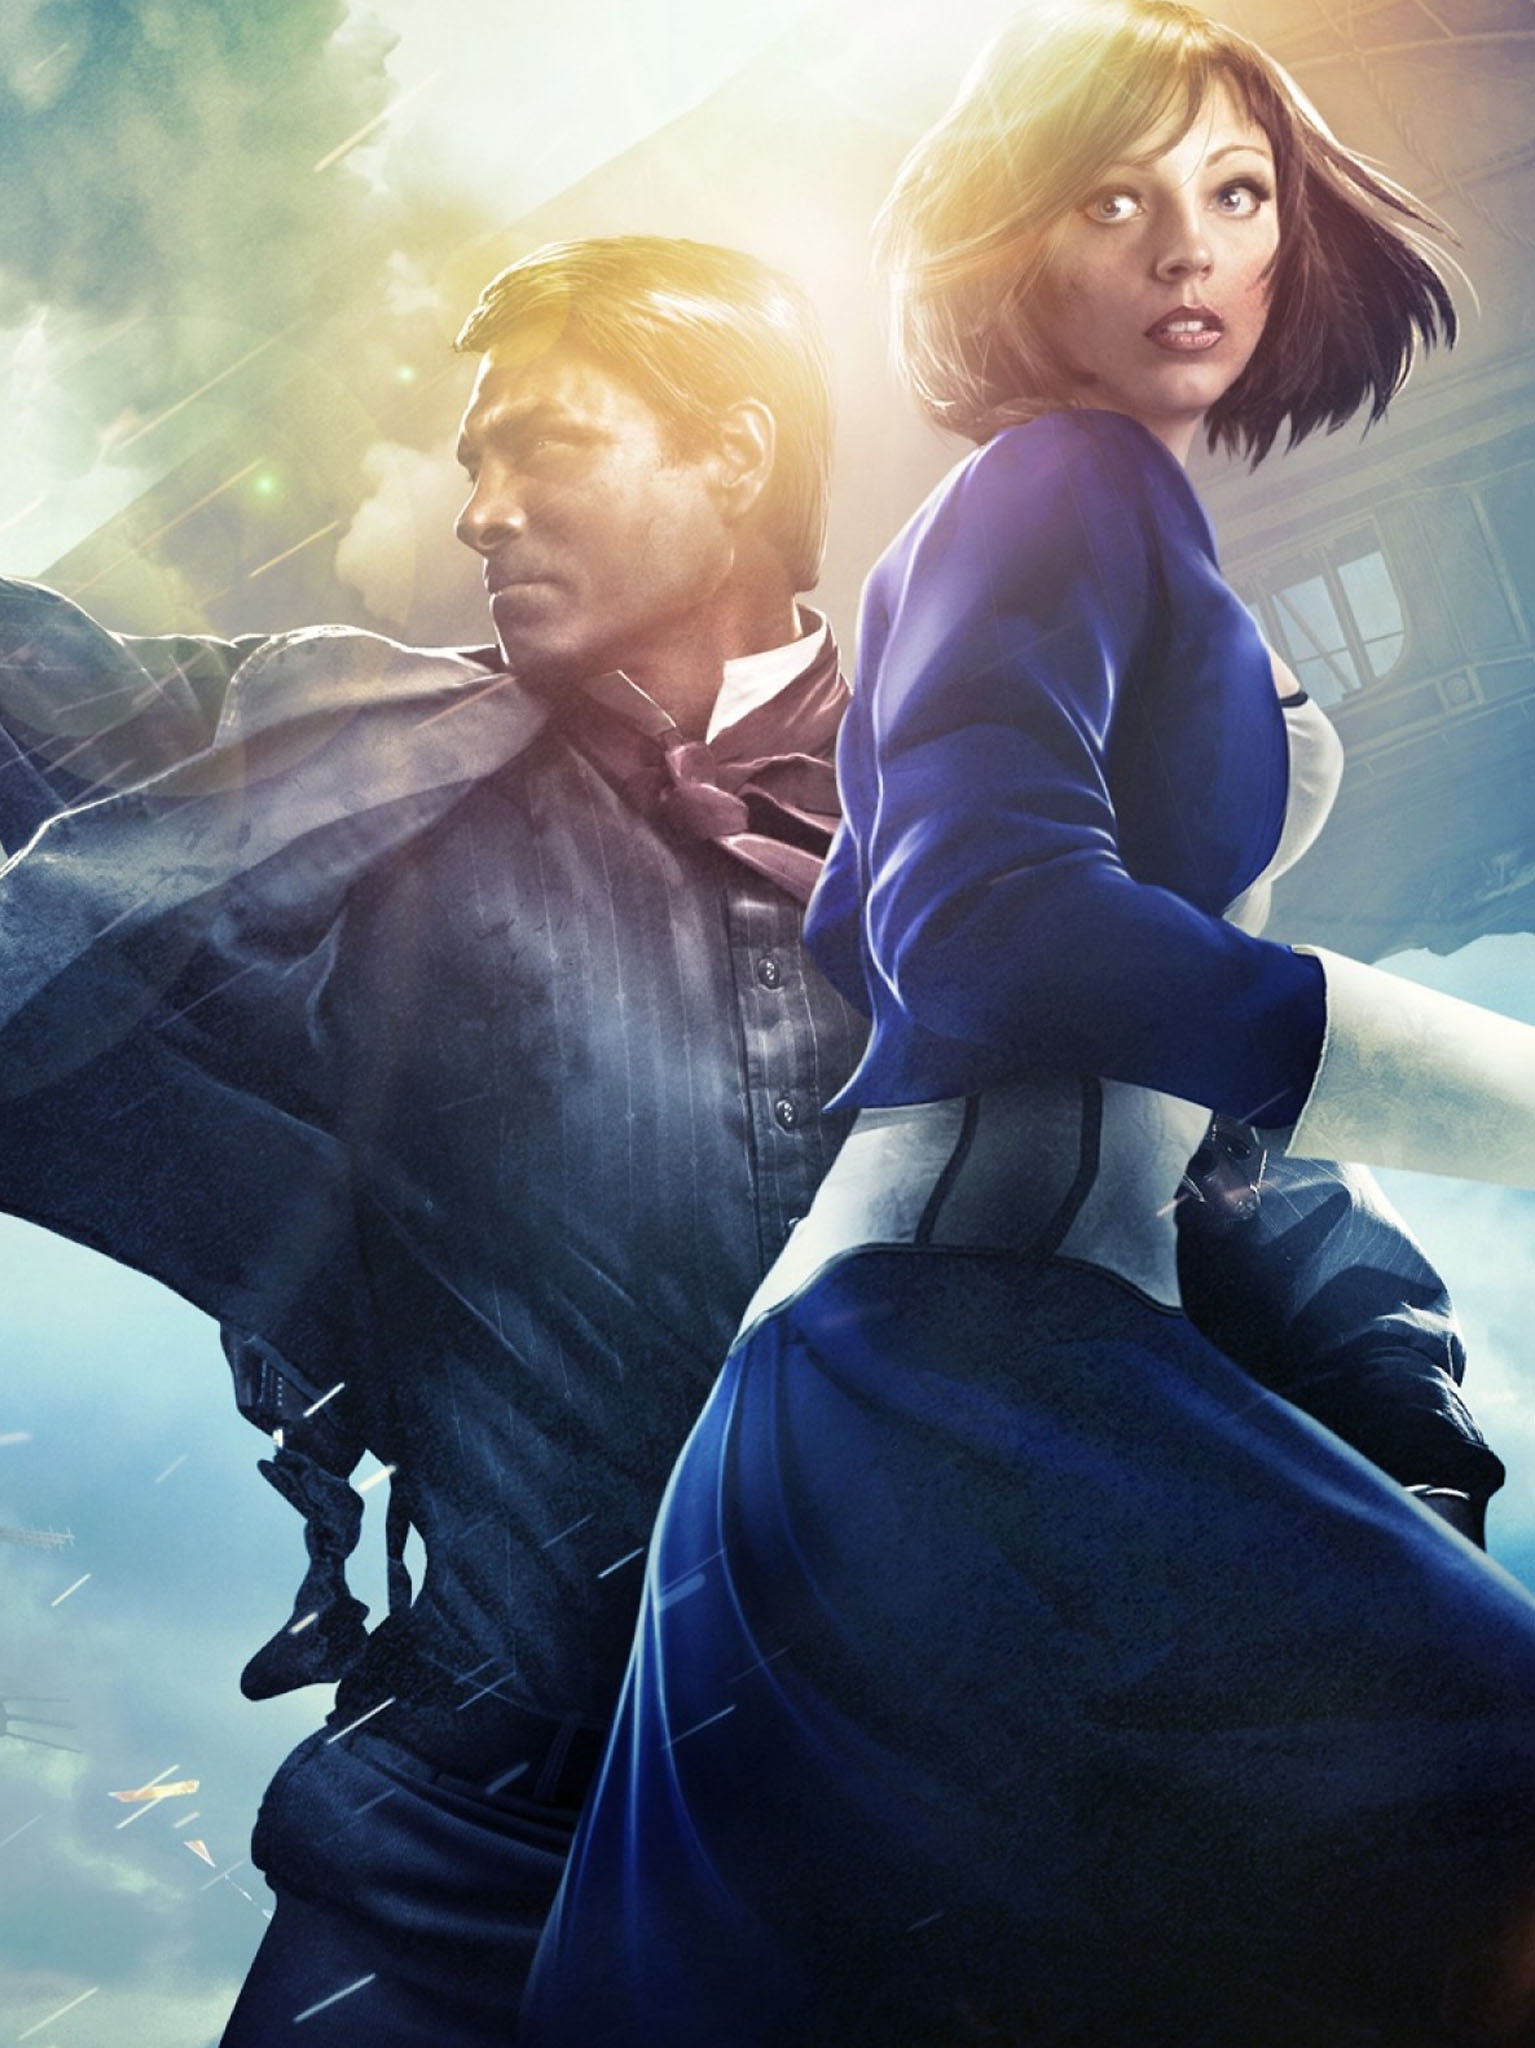 Game wallpapers in het weekend BioShock Infinite   intheGame 1535x2048